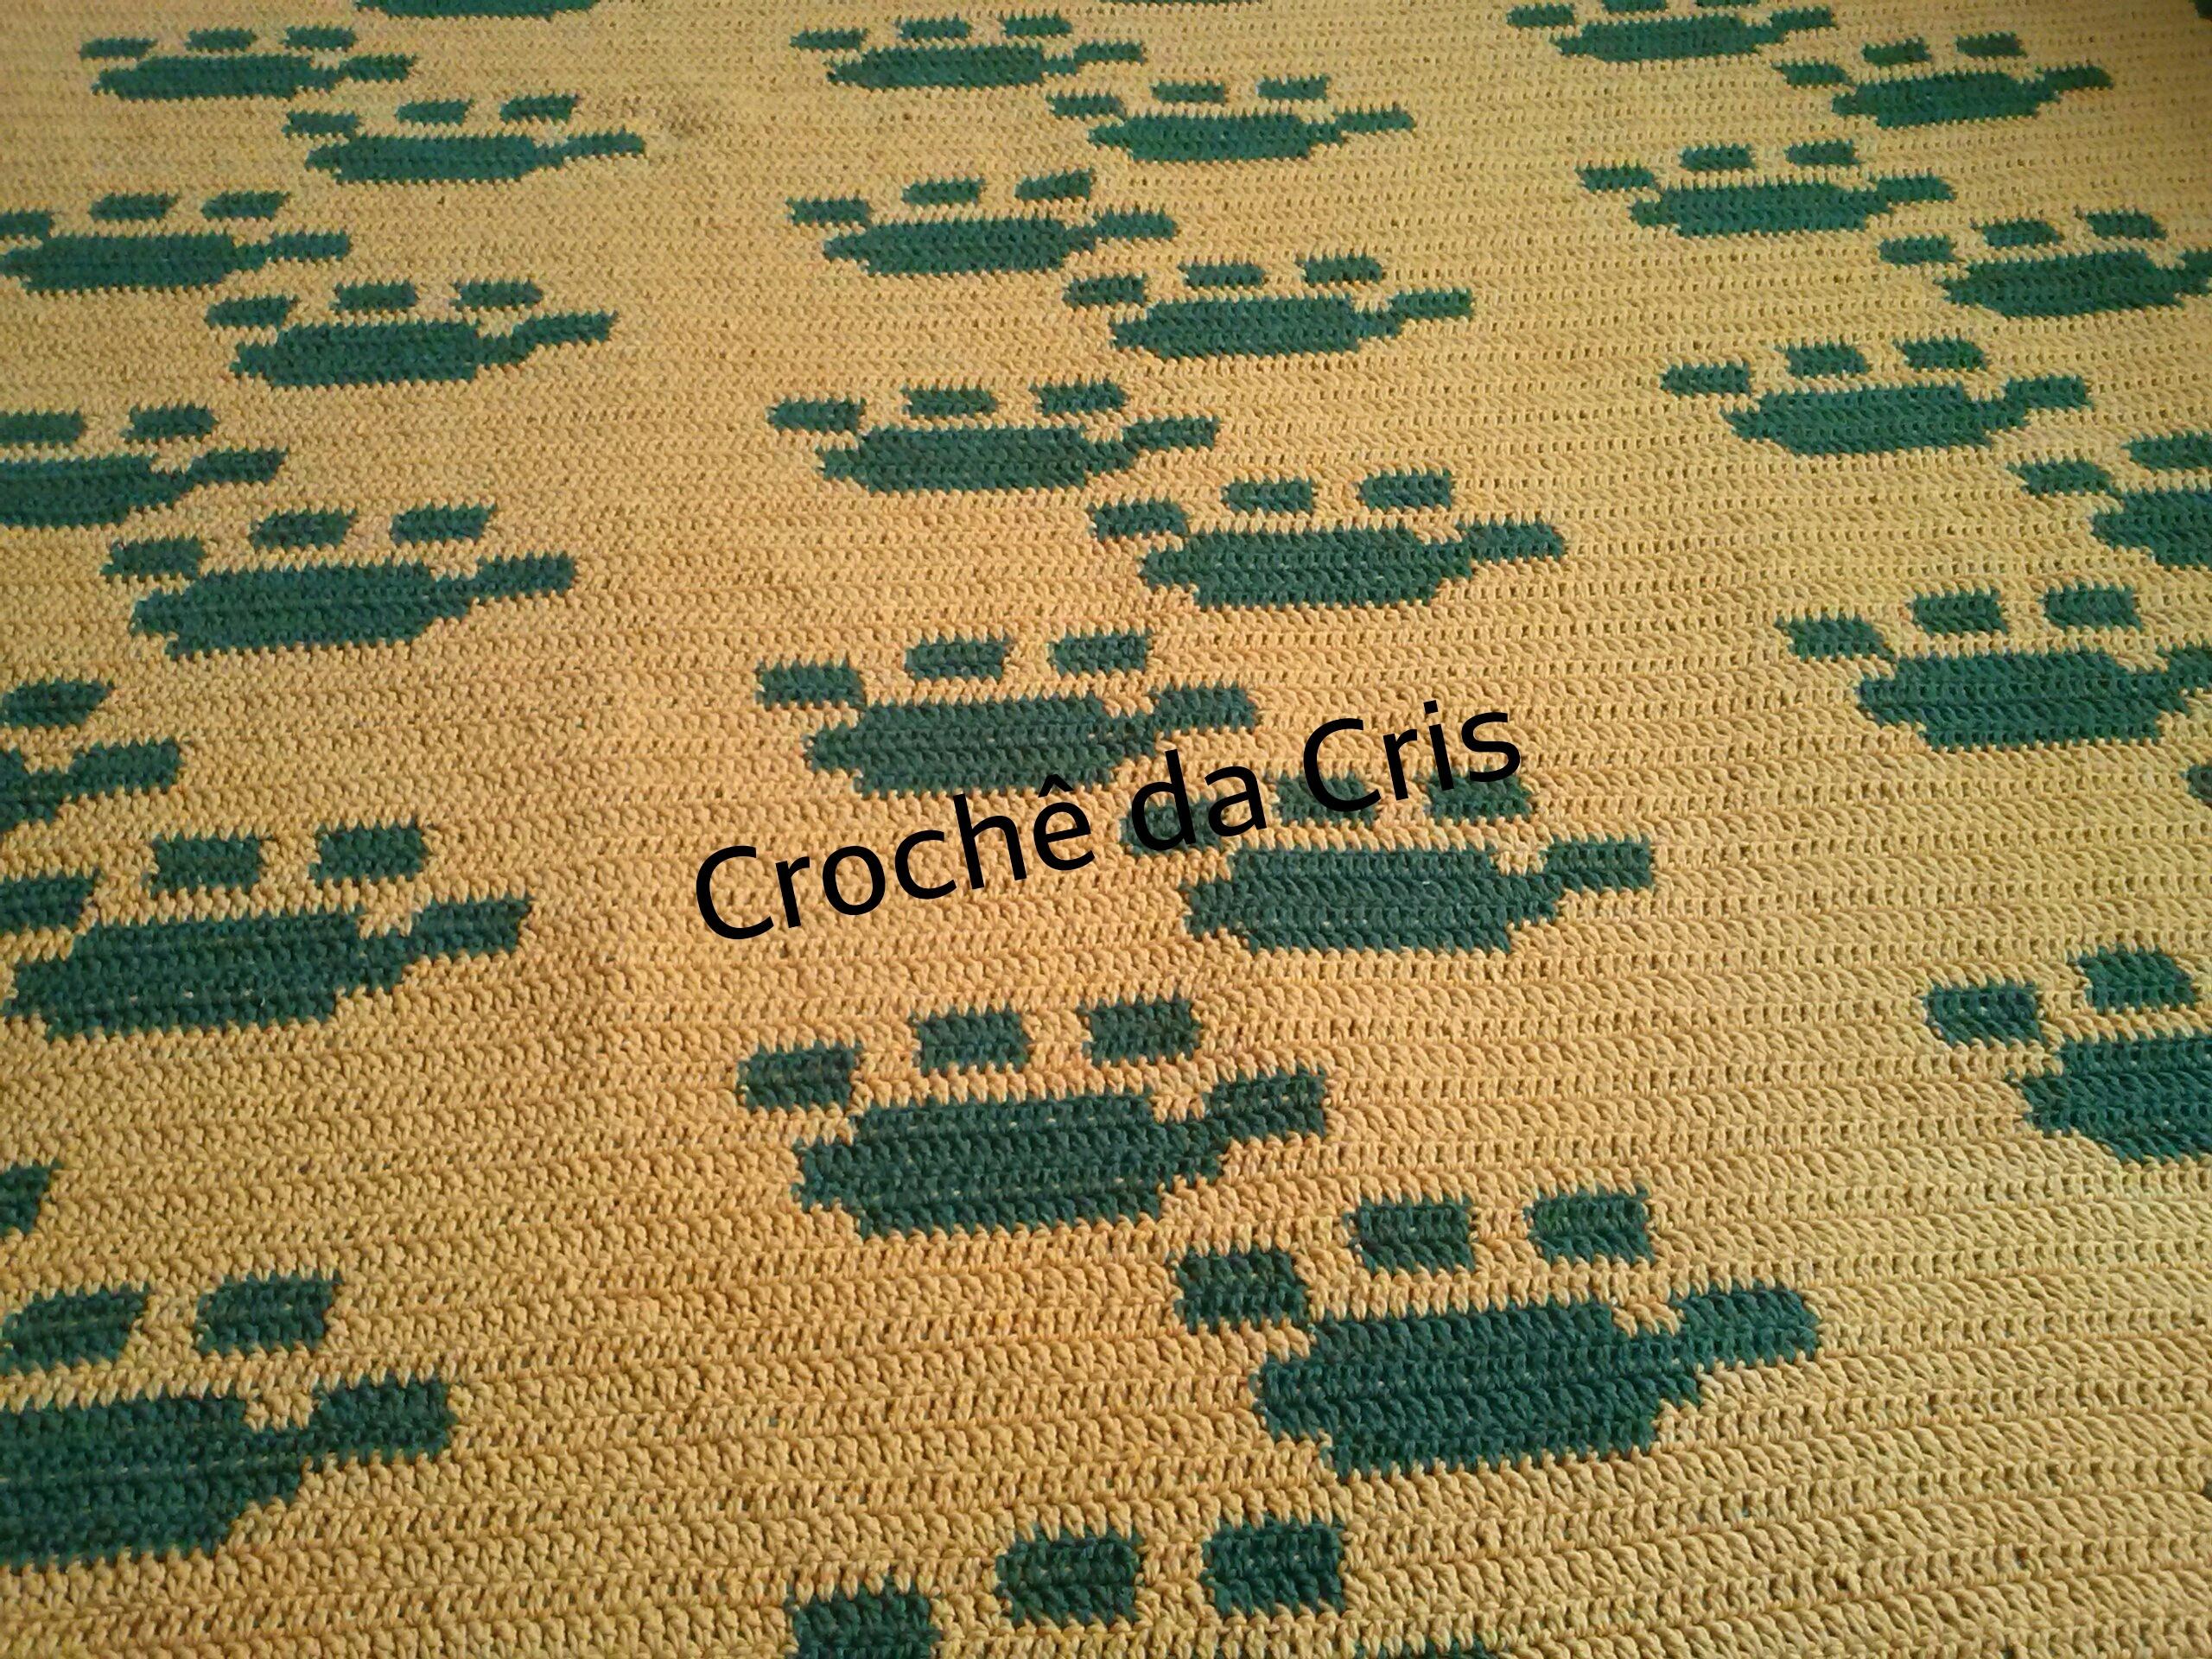 tapete pegadas de cachorro em croche tapete pegadas de cachorro em  #9C762F 2560 1920